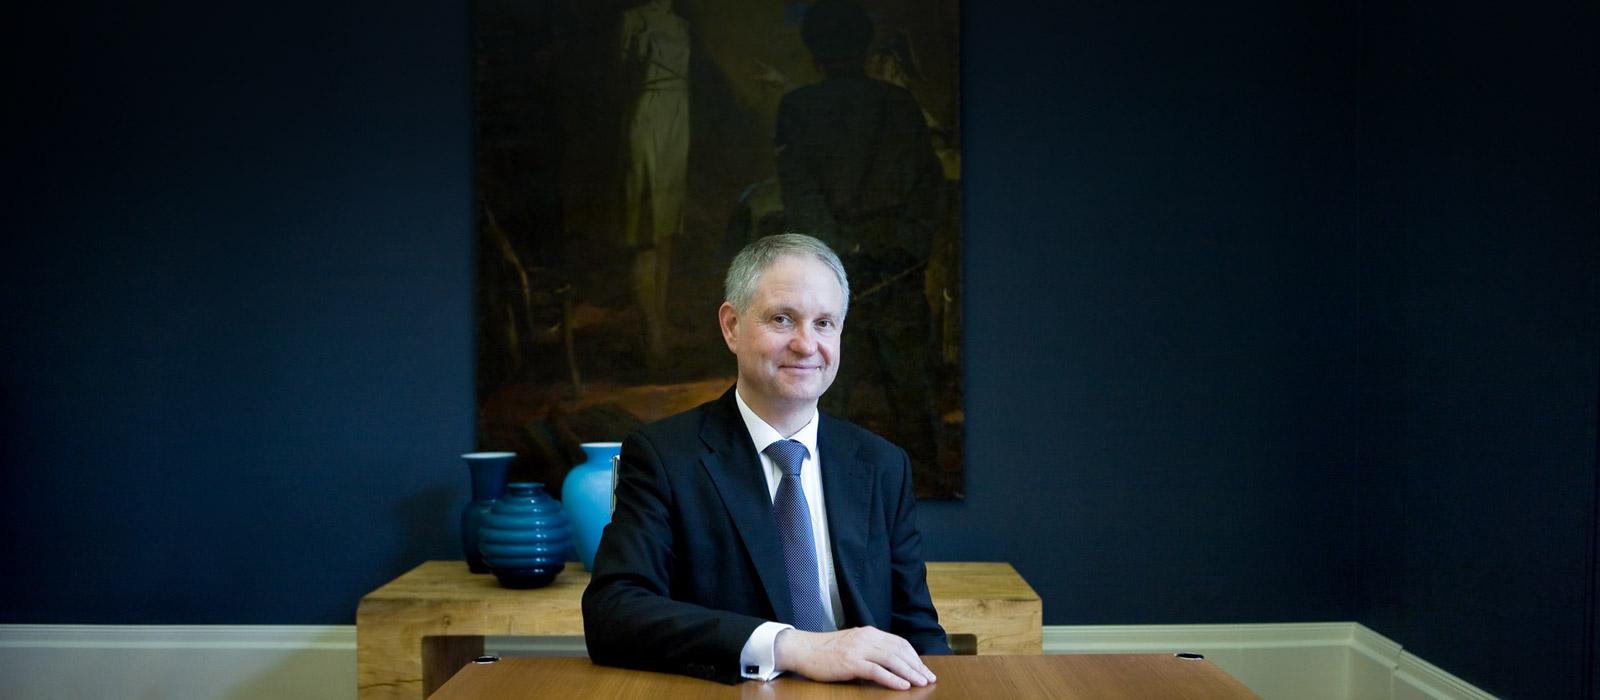 Rechtsanwalt Axel Mütze